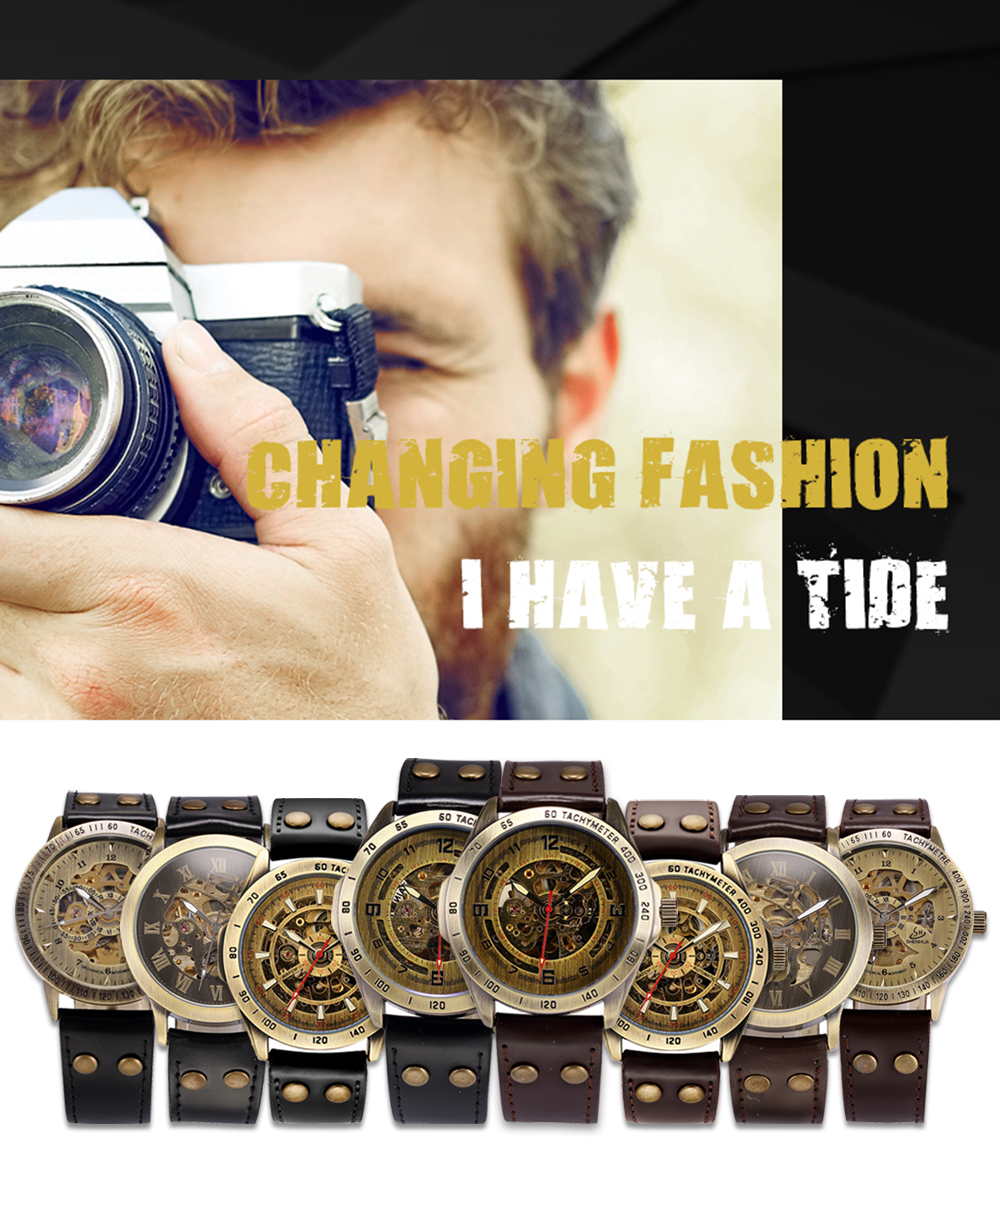 HTB1t1BKP6TpK1RjSZKPq6y3UpXaw Skeleton Mechanical Watch Automatic Watch Men Steampunk Bronze Transparent Mens Automatic Mechanical Watches Clock montre homme